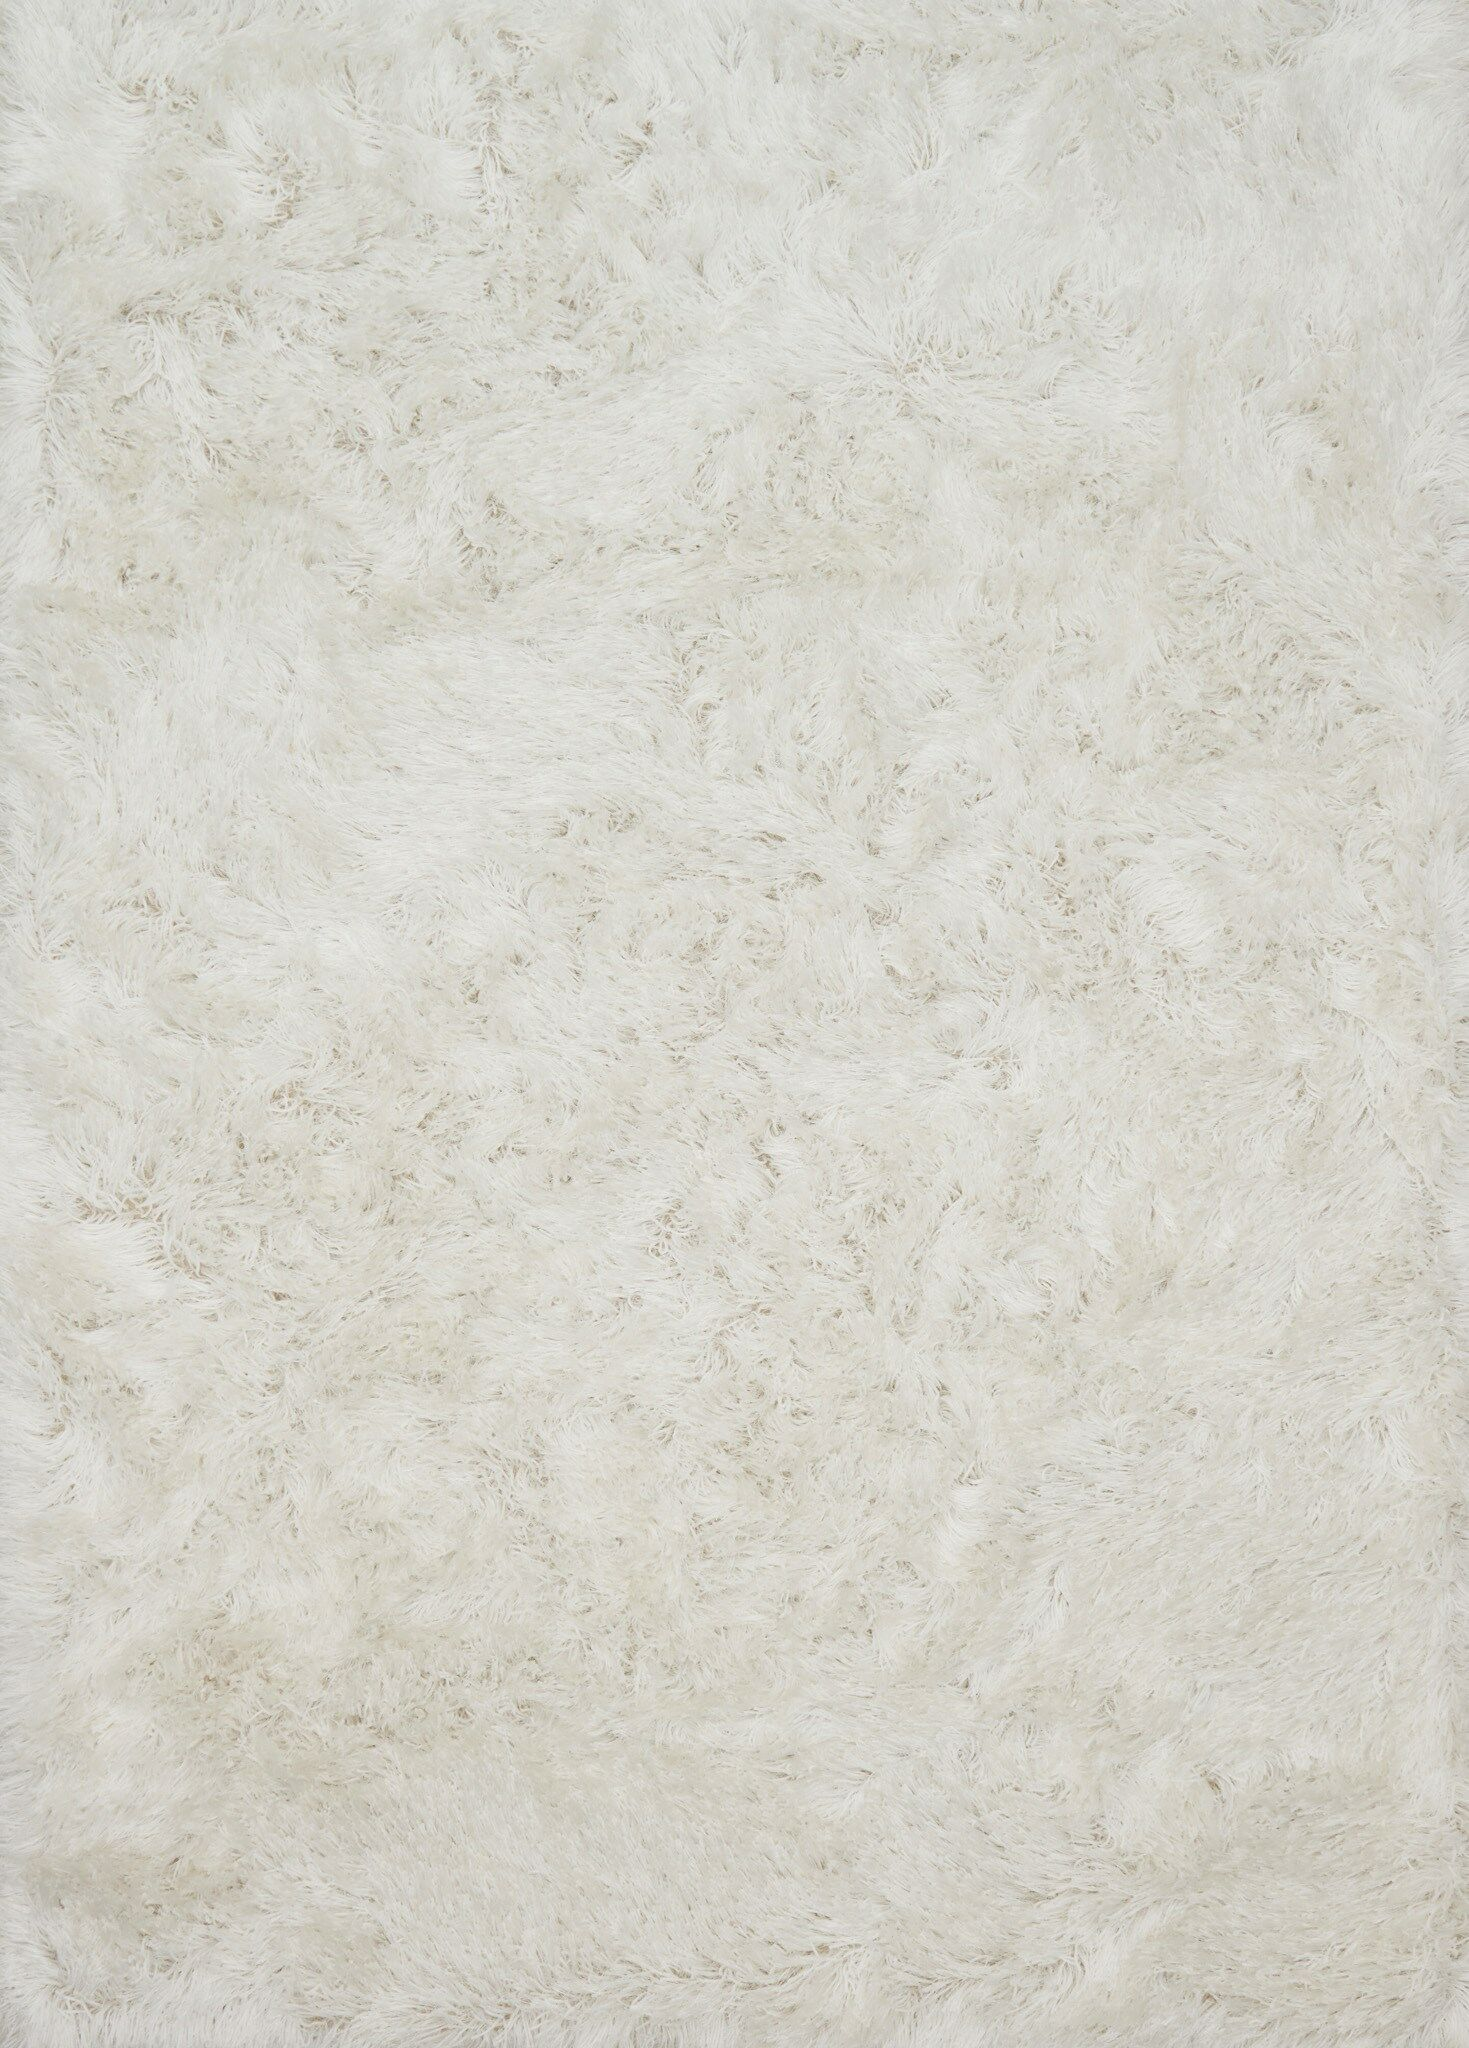 Elliana Shag Hand-Tufted White Area Rug Rug Size: Rectangle 2'3